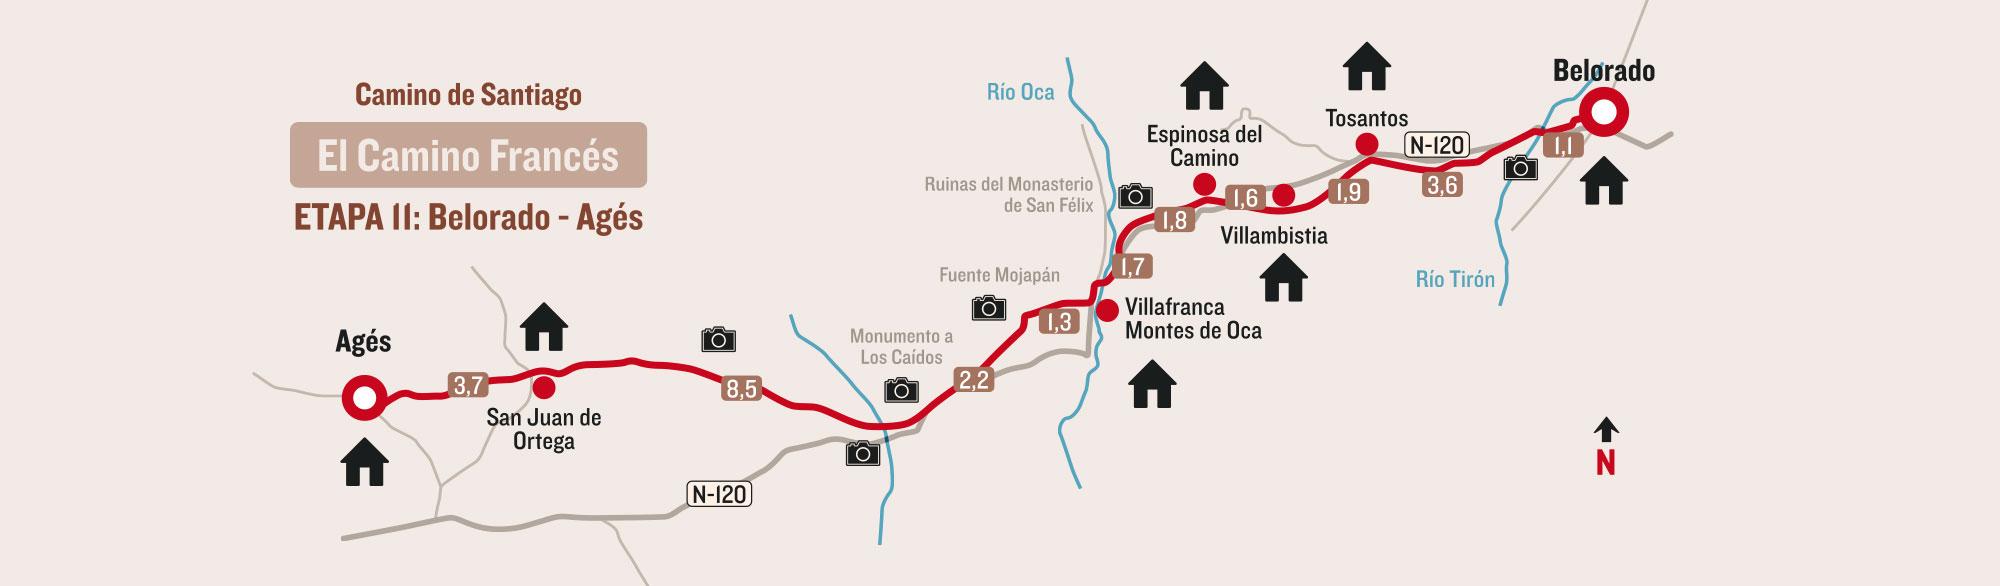 mapa-camino-santiago